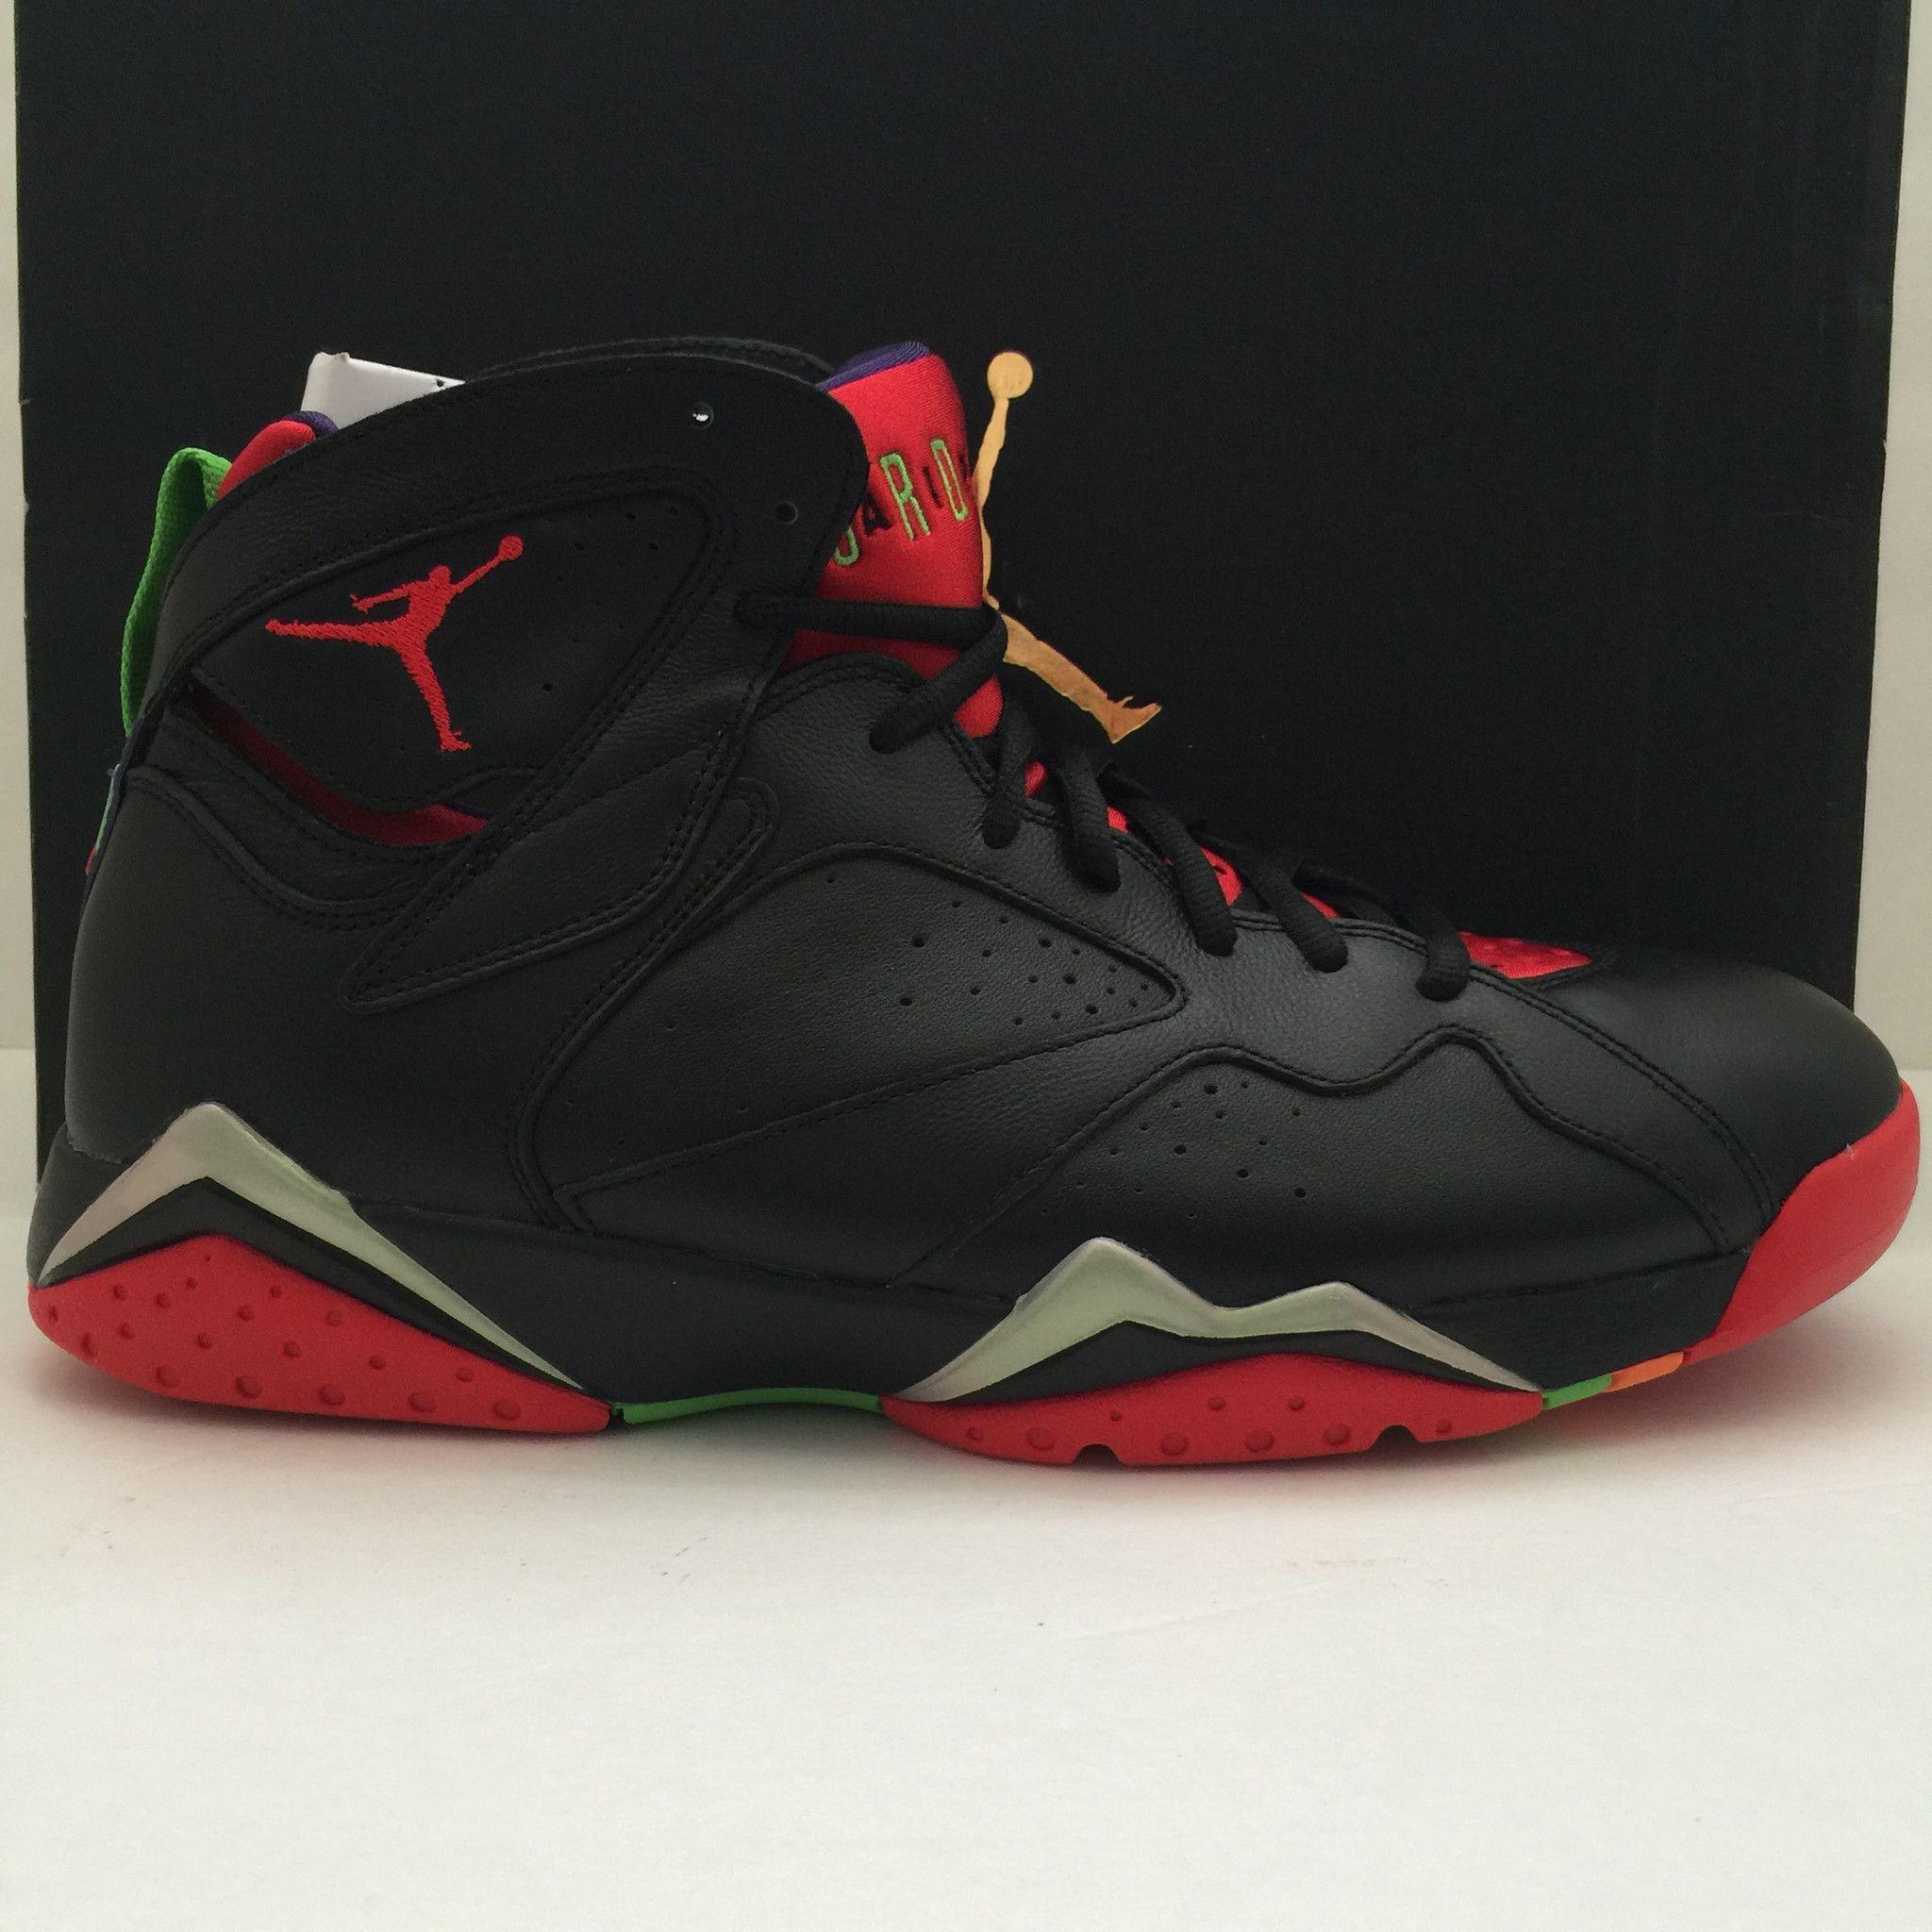 "Name Nike Air Jordan 7 Retro ""Marvin The Martian"" Size"